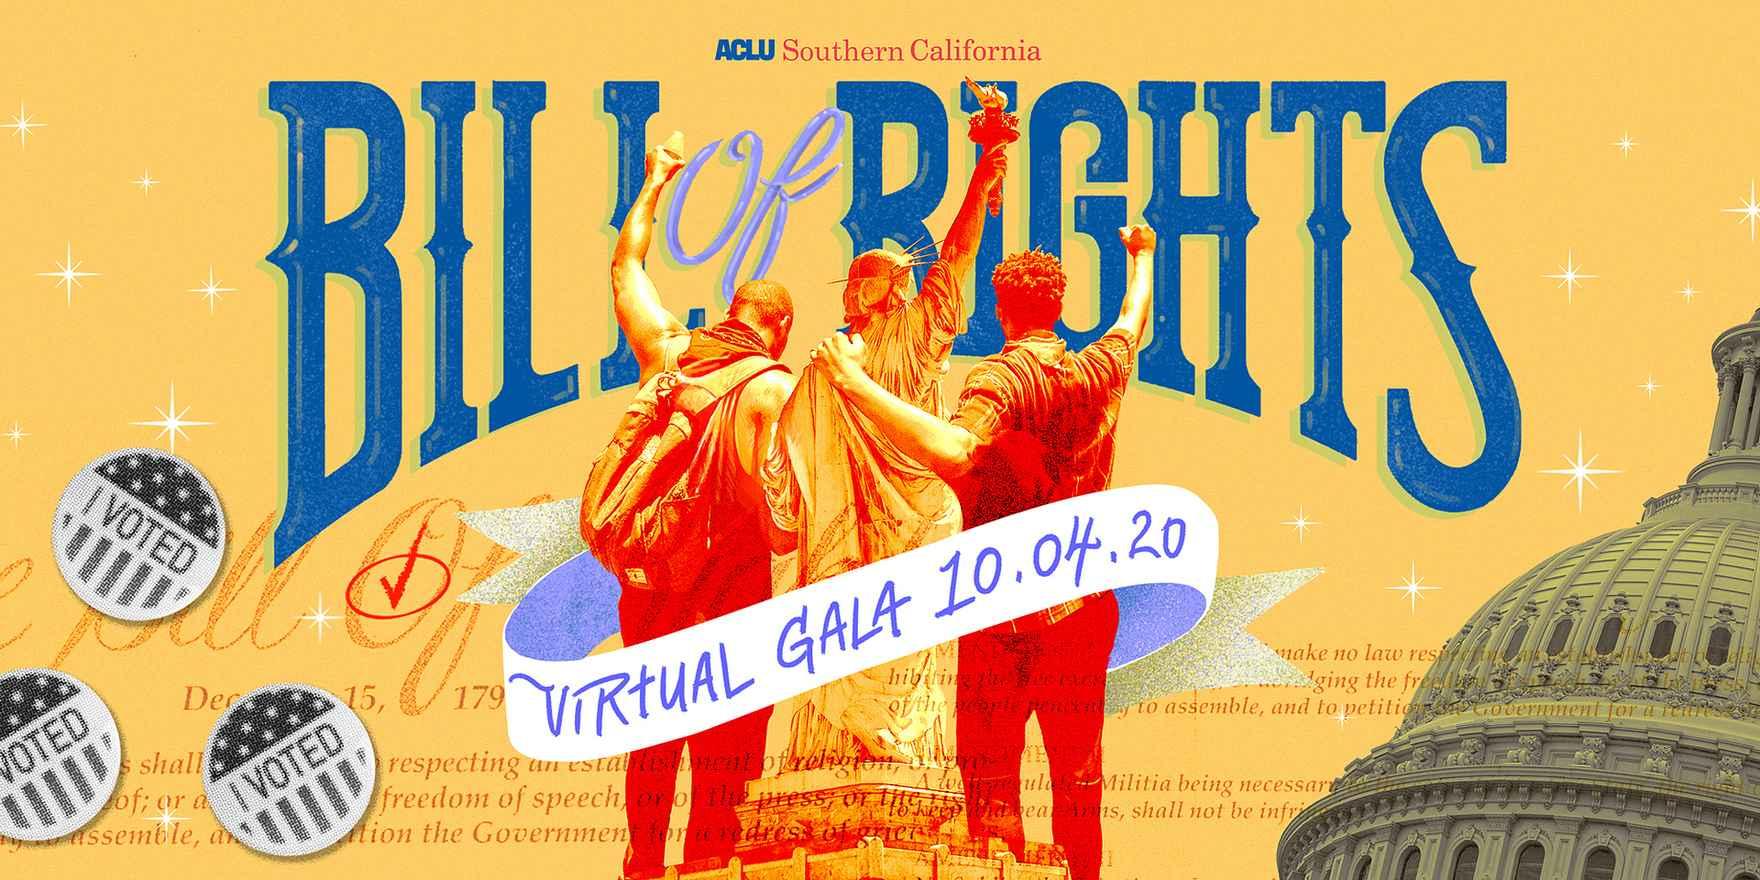 ACLU-BillofRights-Banner_1000x2000.jpg